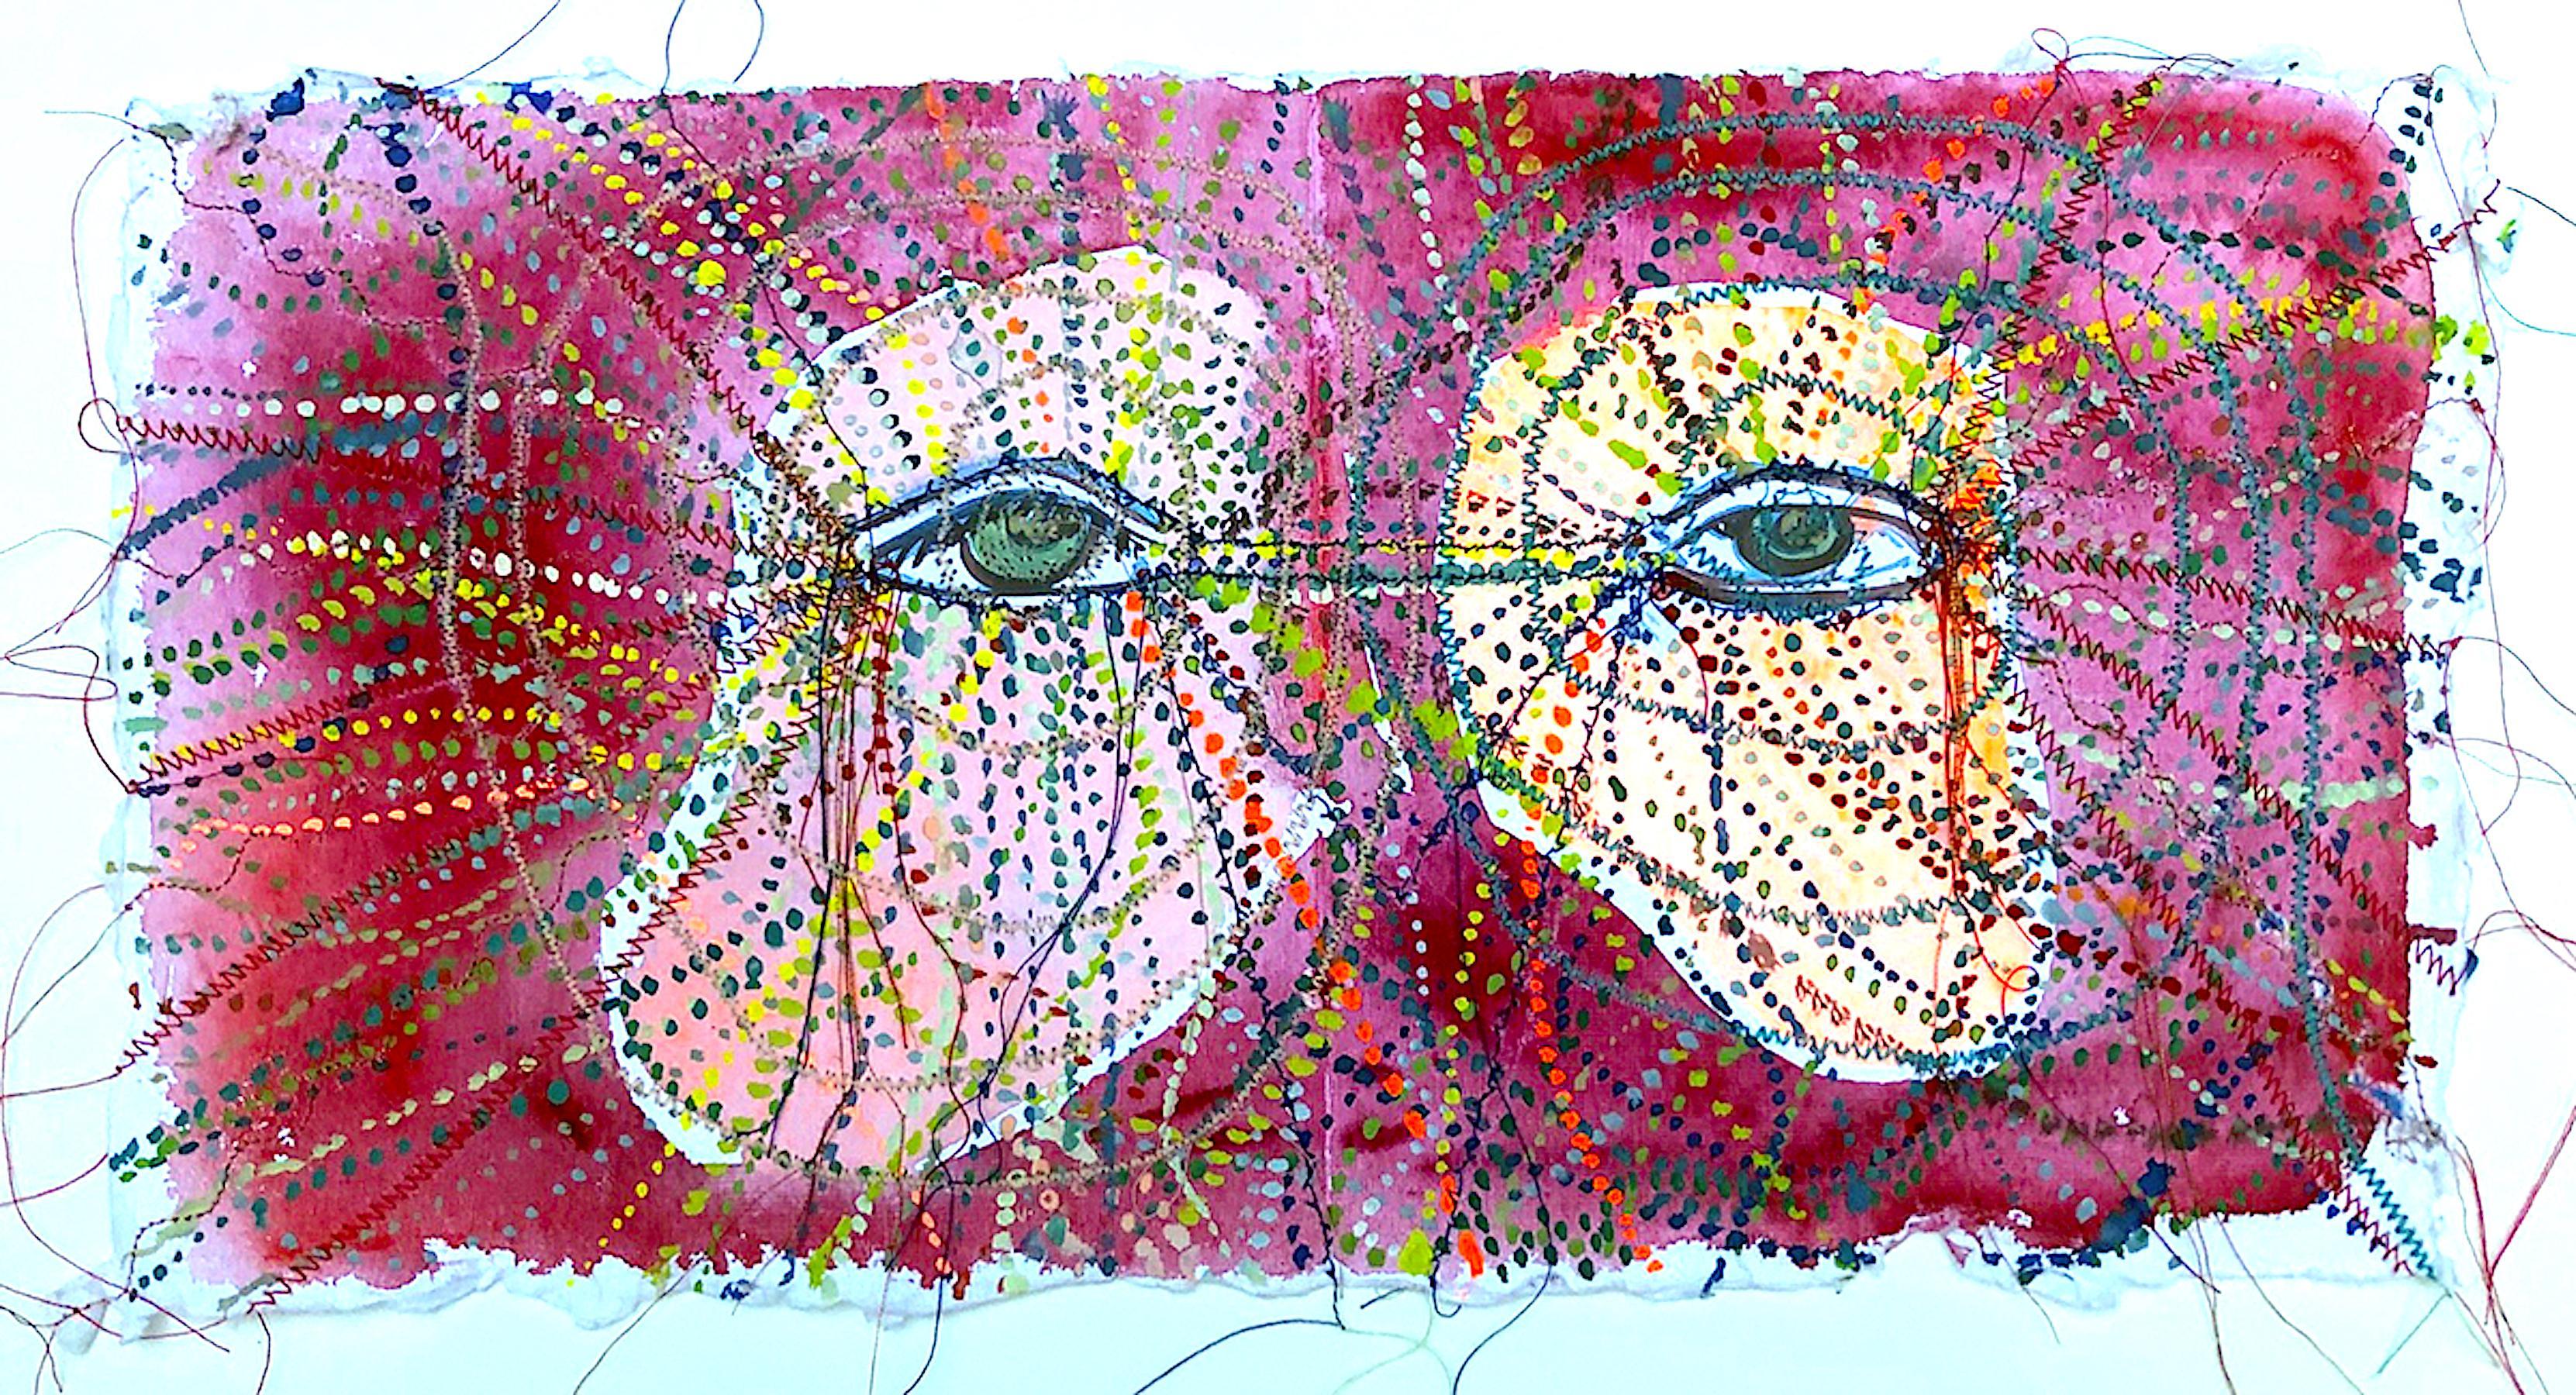 Alexandra Rutsch Brock, Seeing Breathing, 2020, gouache, thread, 8 x 15 in